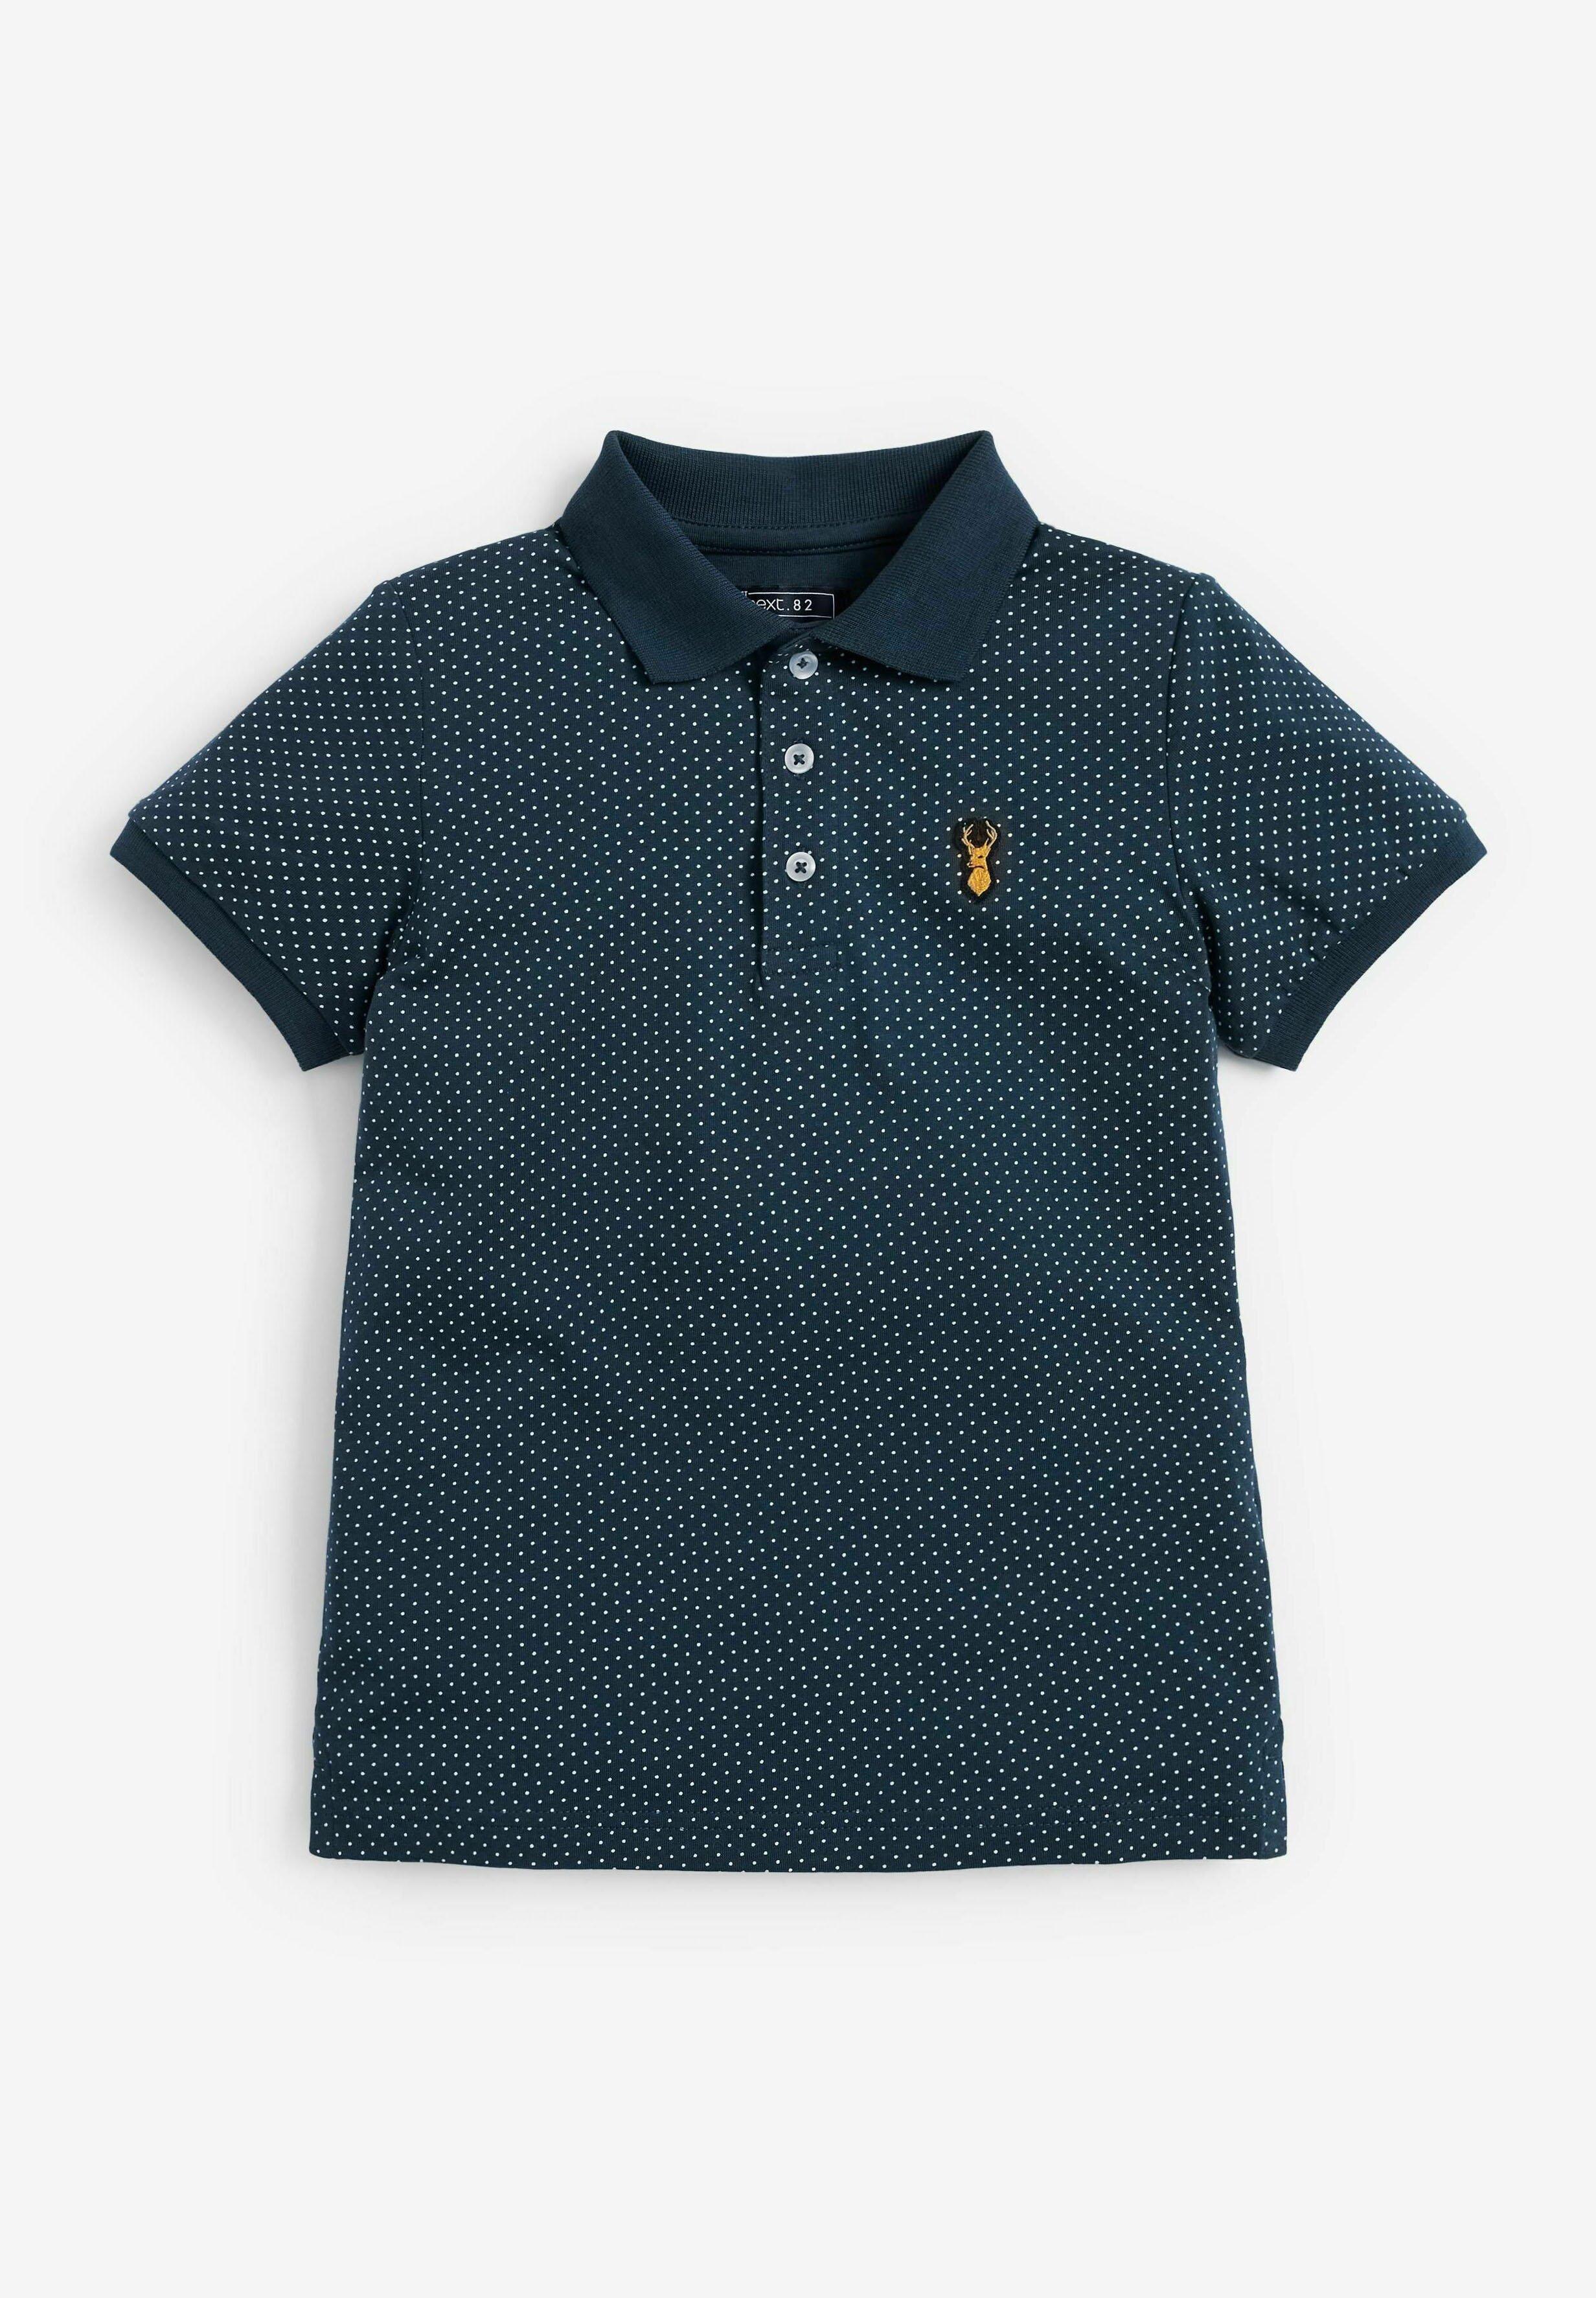 Jacky Jungen Kombination Poloshirt und Hose Ocean Boys Marine